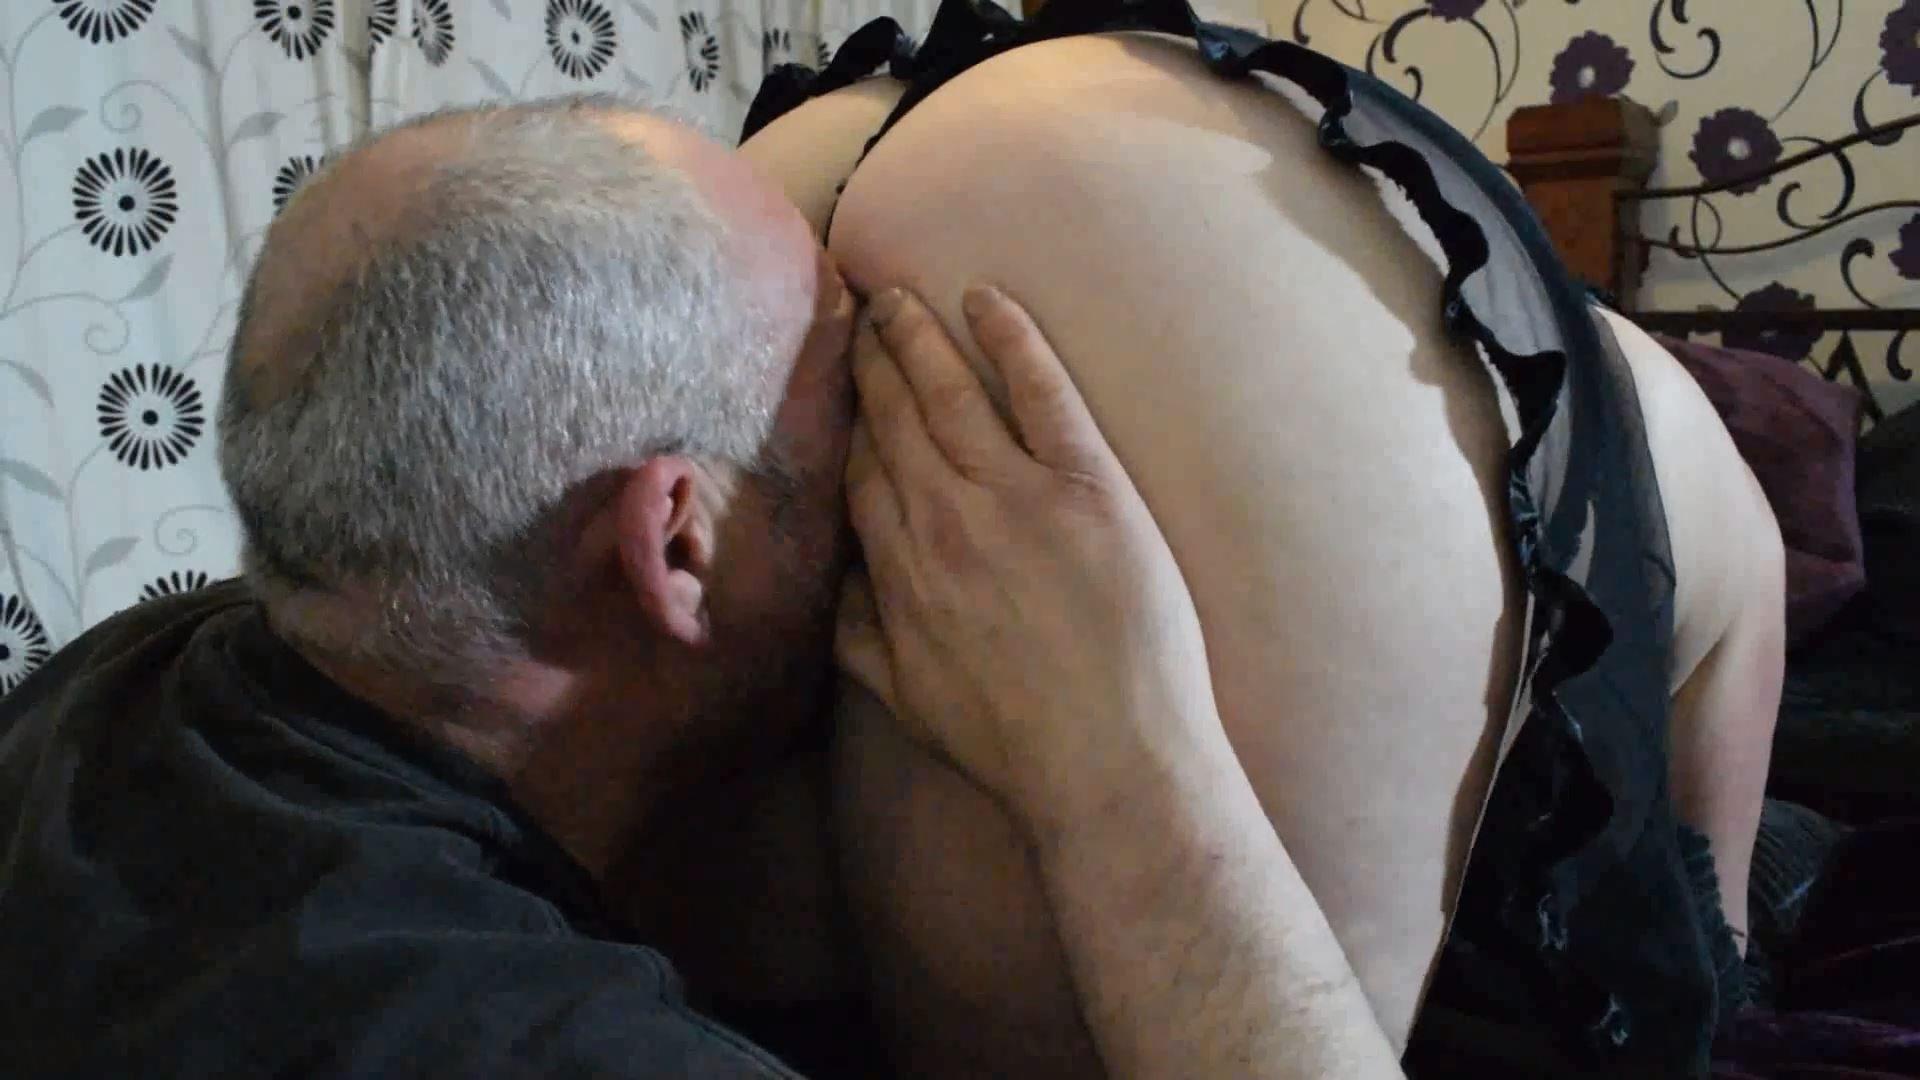 BBW ASS RIMMING - TEMPTRESS LADY UK - FULL HD/1080p/MP4